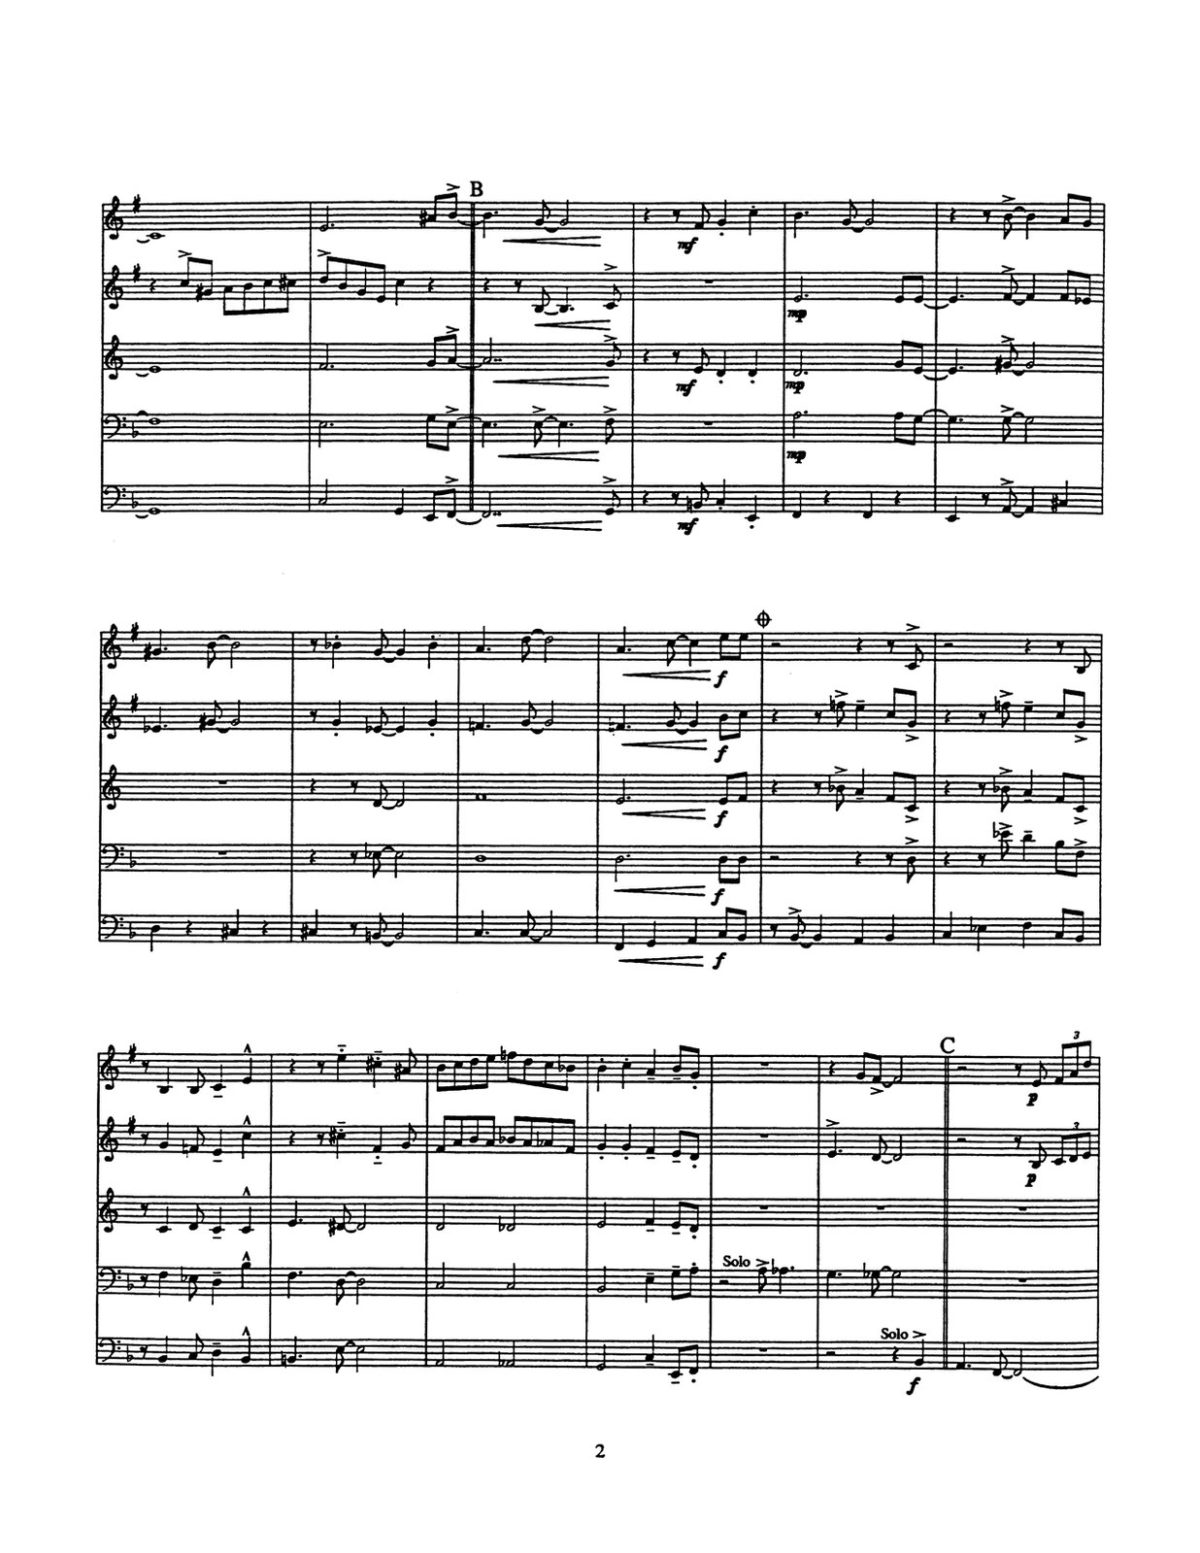 Endsley, Brass in Blue-p14